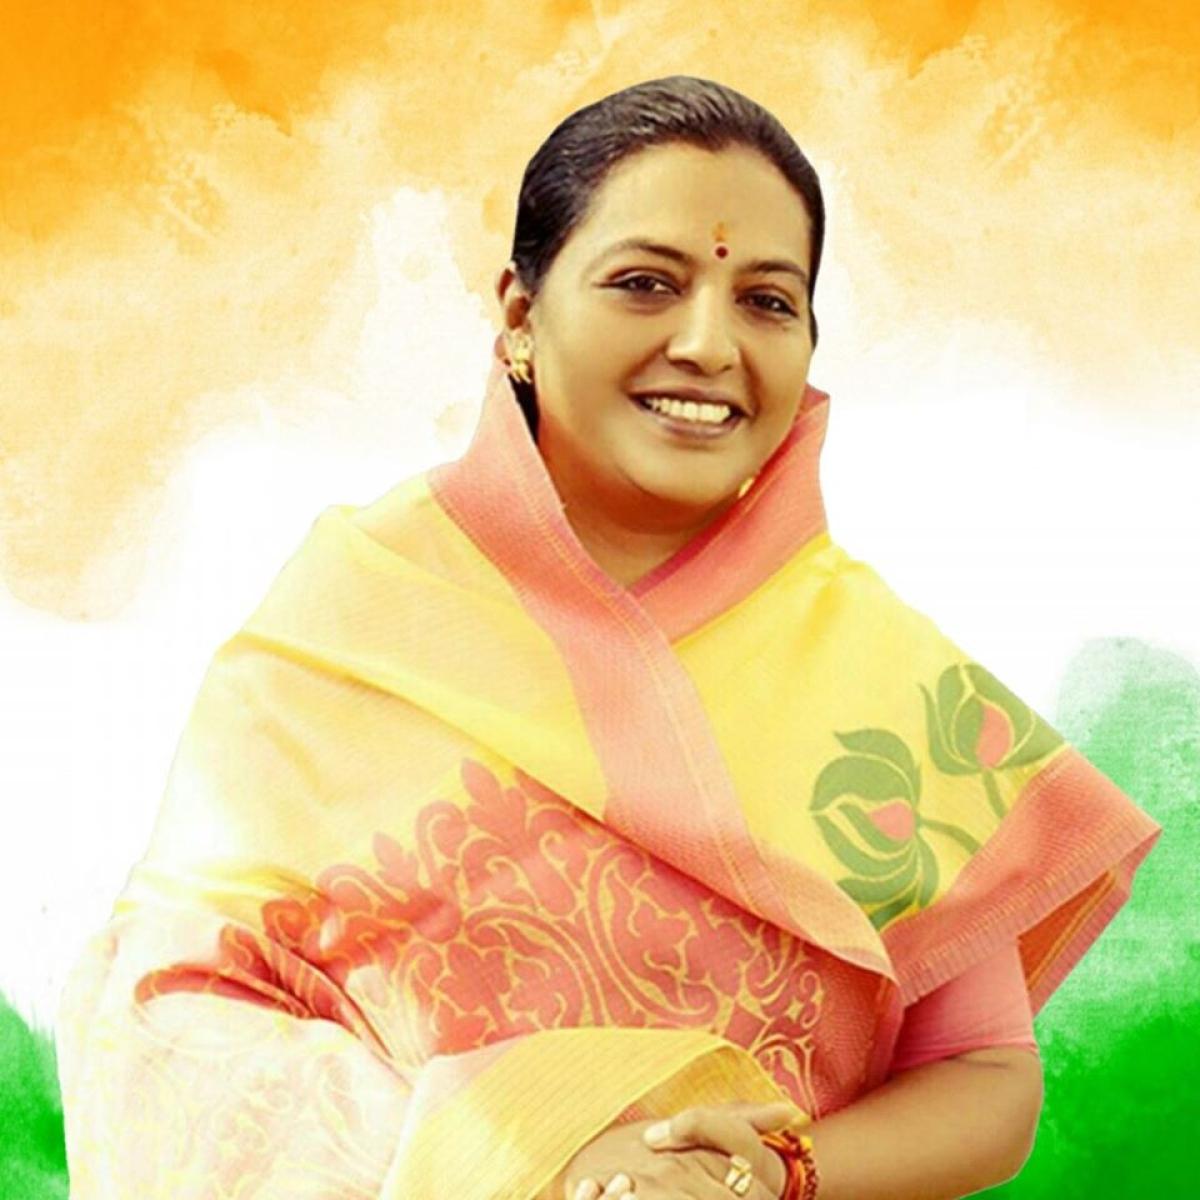 'Ye BJP me jayegi': Twitter trolls Maha minister Yashomati Thakur for saying 'touching a cow drives away negativity'